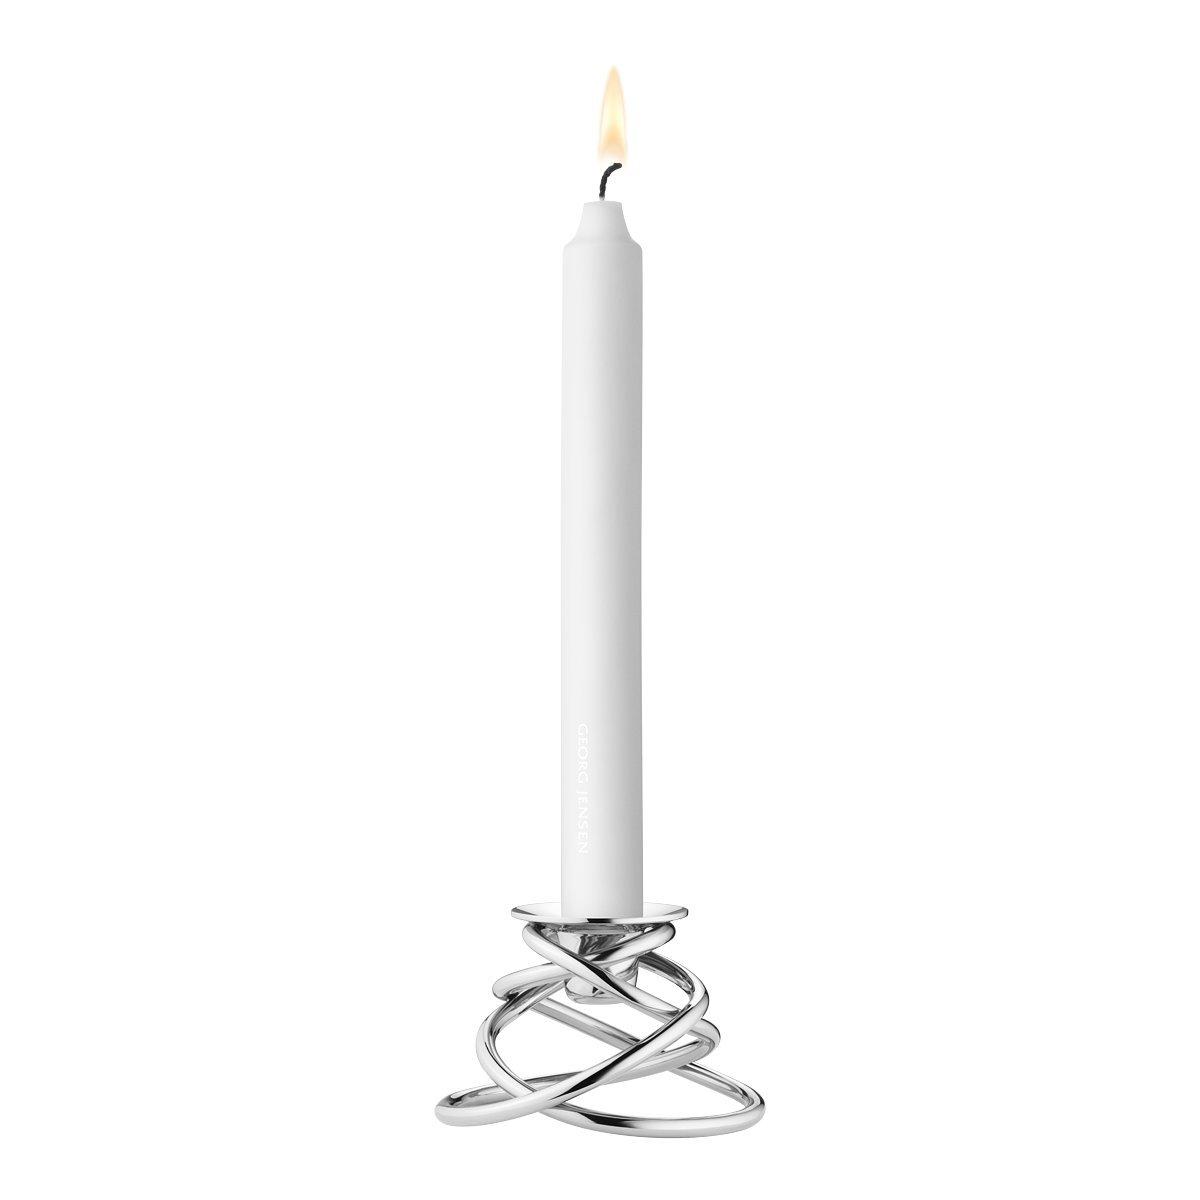 GEORG JENSEN Glow portacandela, in Acciaio Inox 3586140